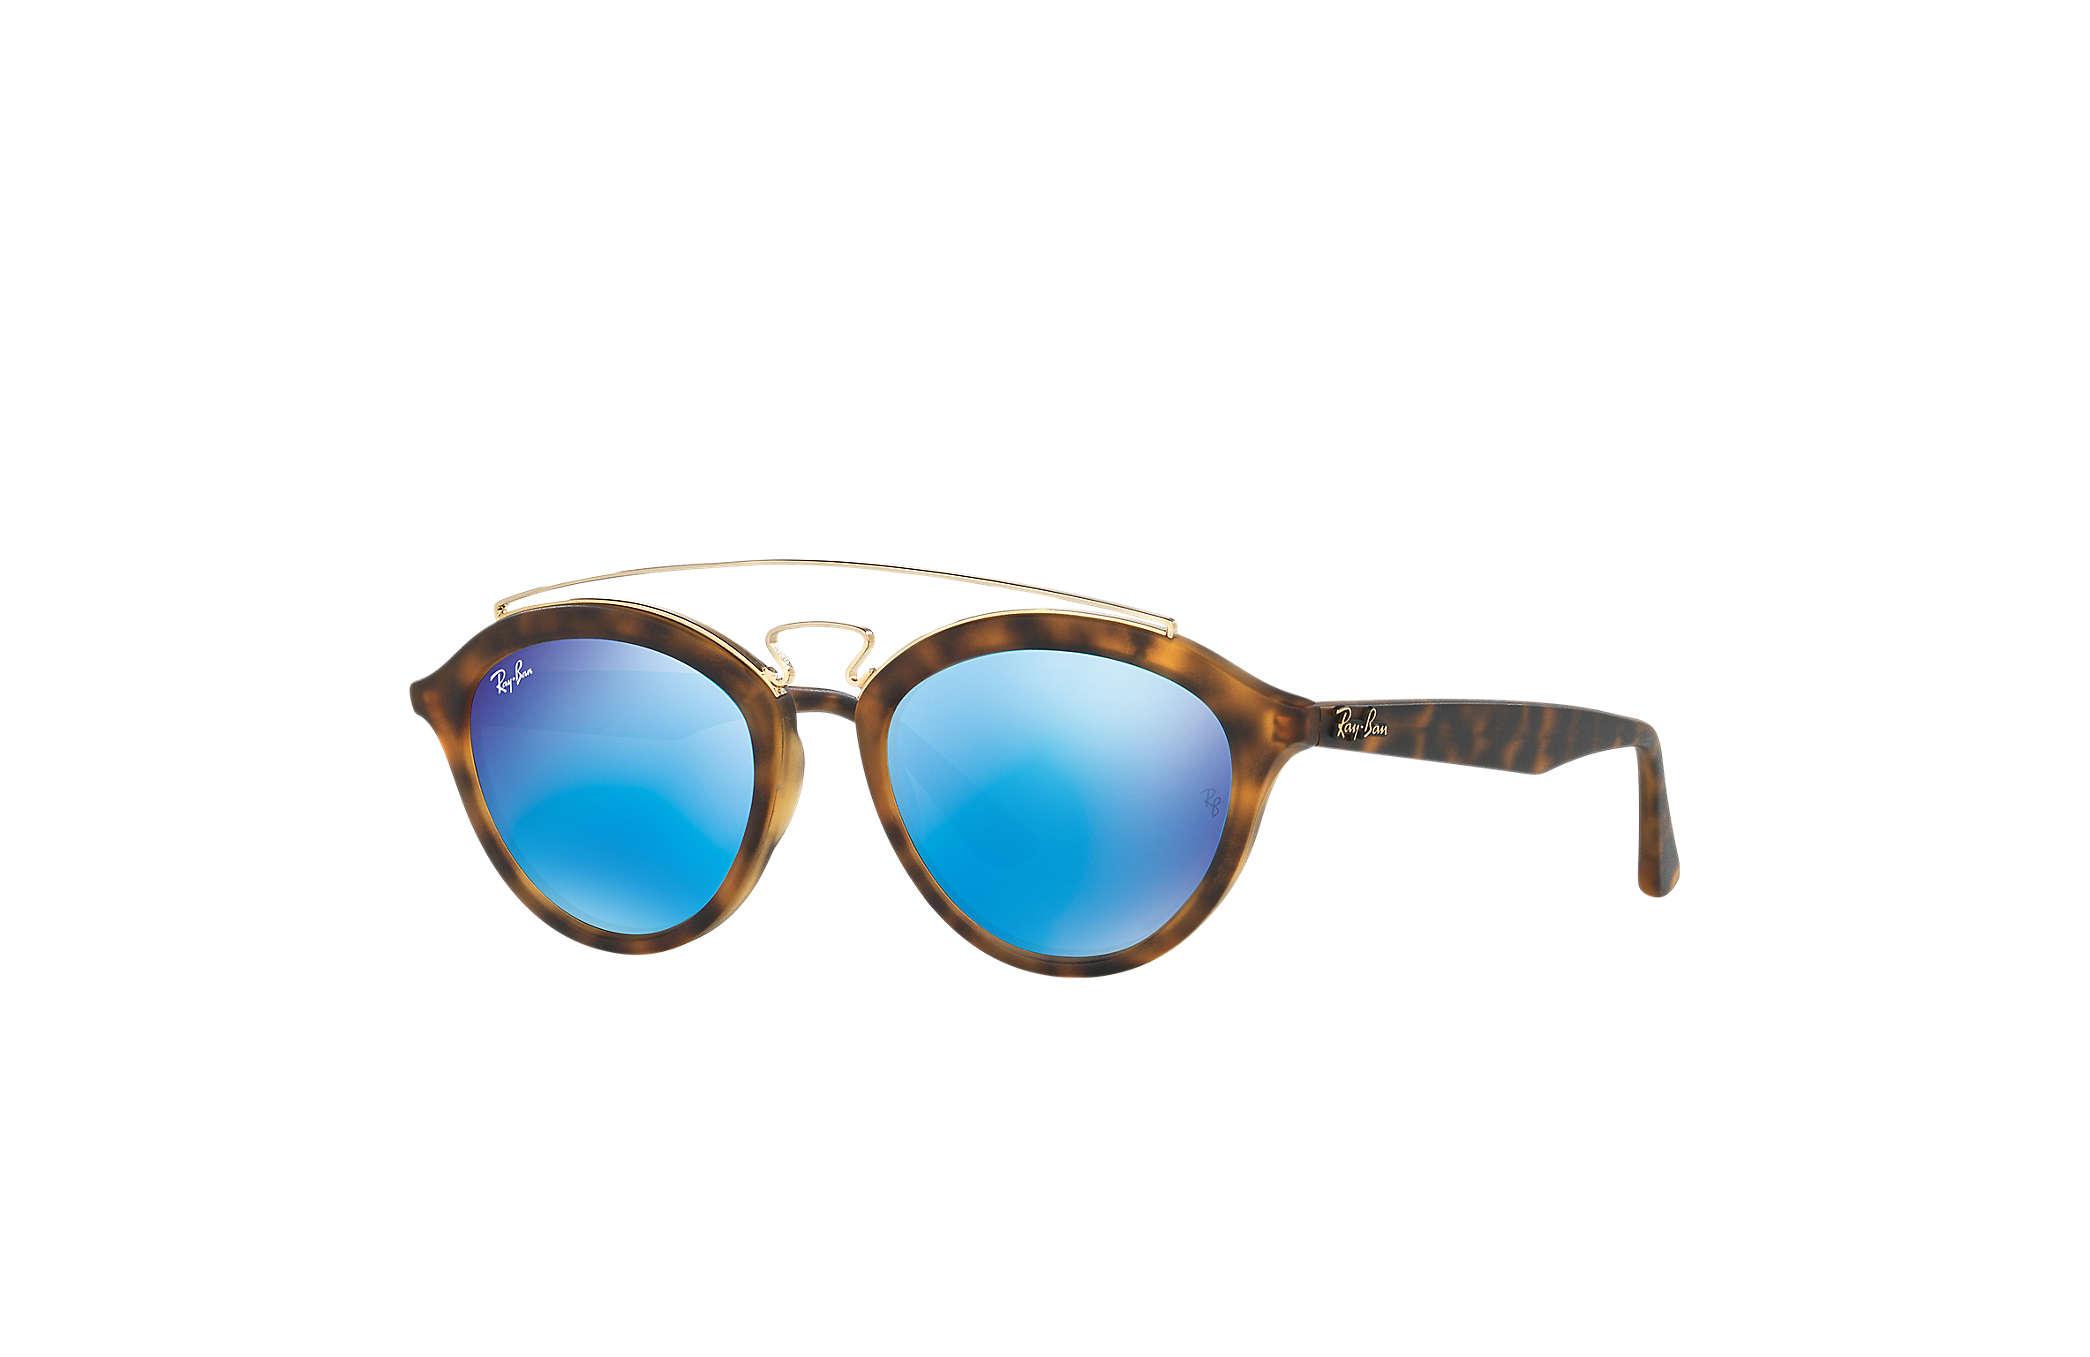 a4c4f68487cf3 Oculos Ray Ban Azul Espelhado Masculino « One More Soul